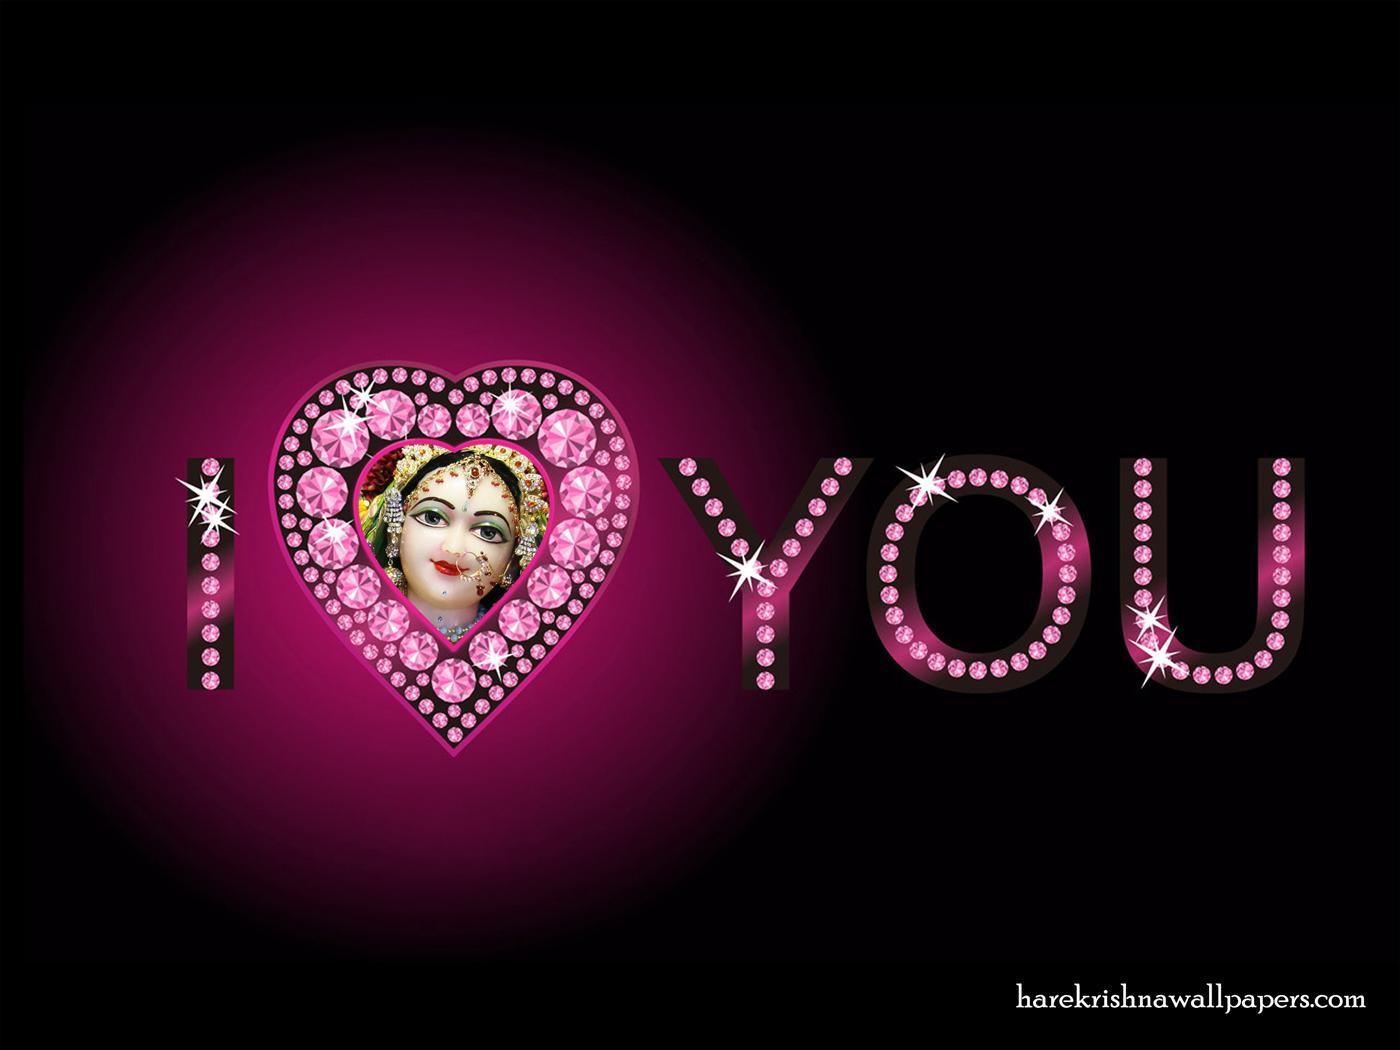 I Love You Radharani Wallpaper (015) Size 1400x1050 Download